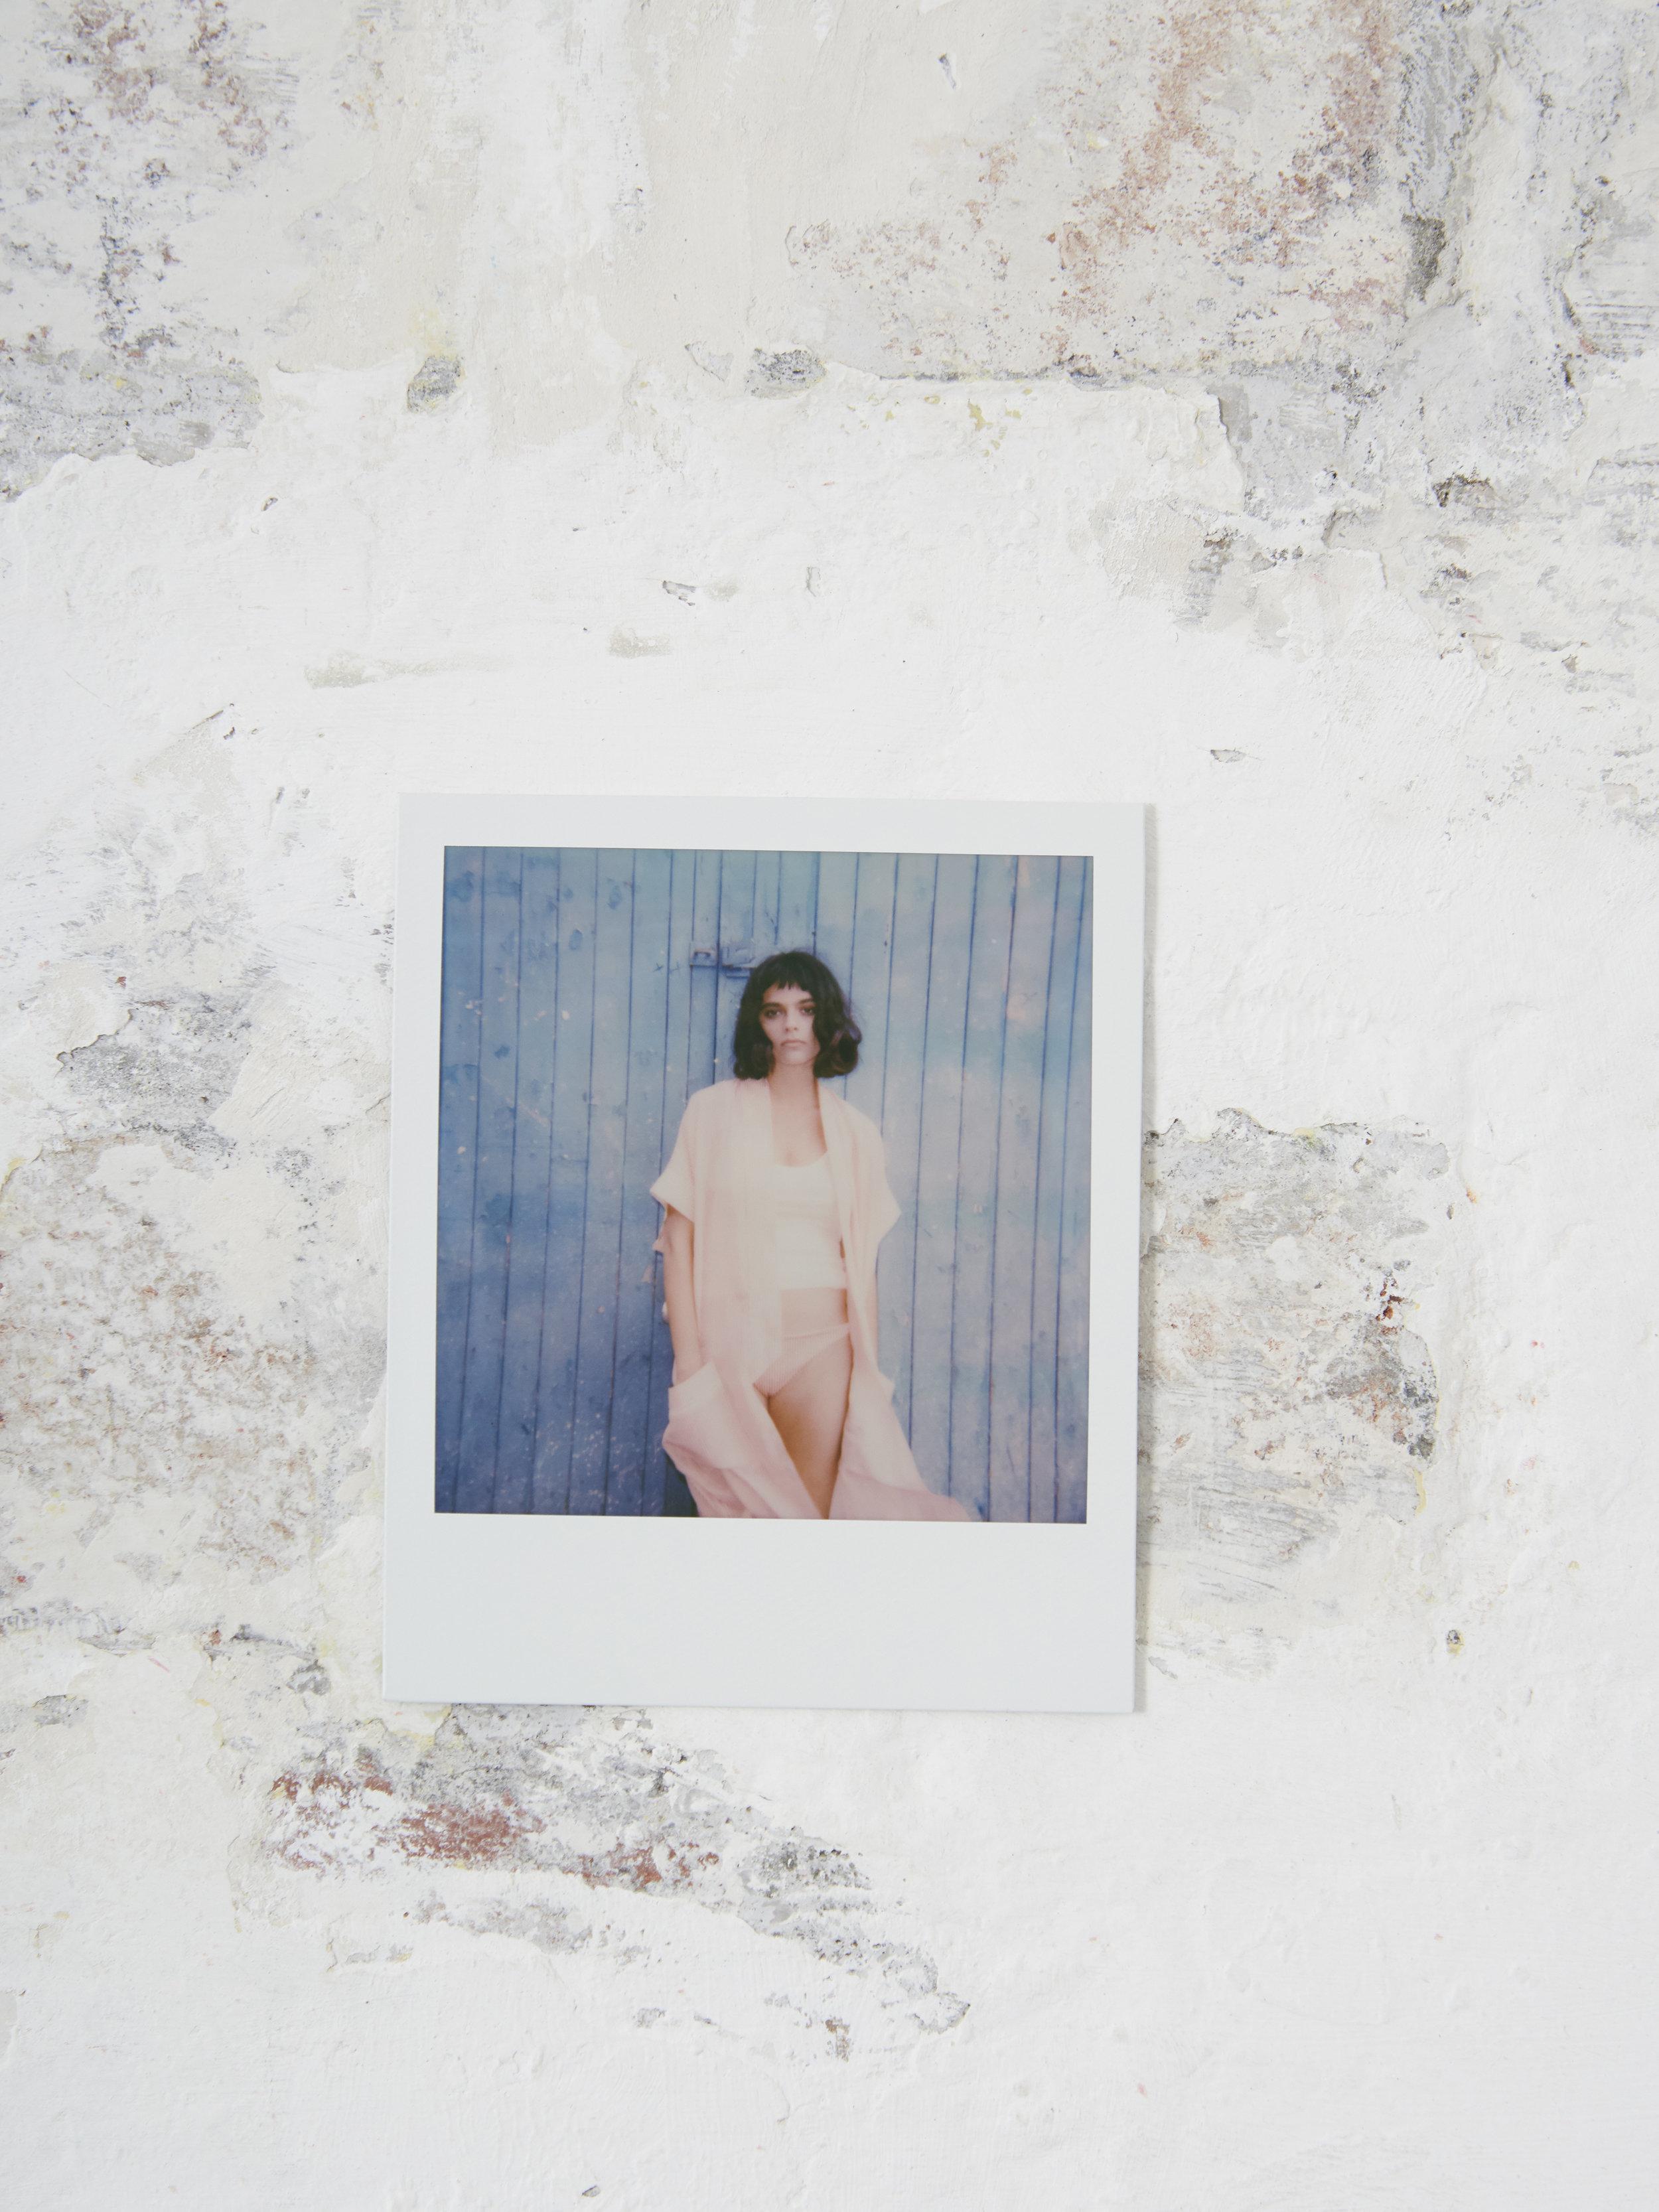 VW_Polaroids_004.jpg